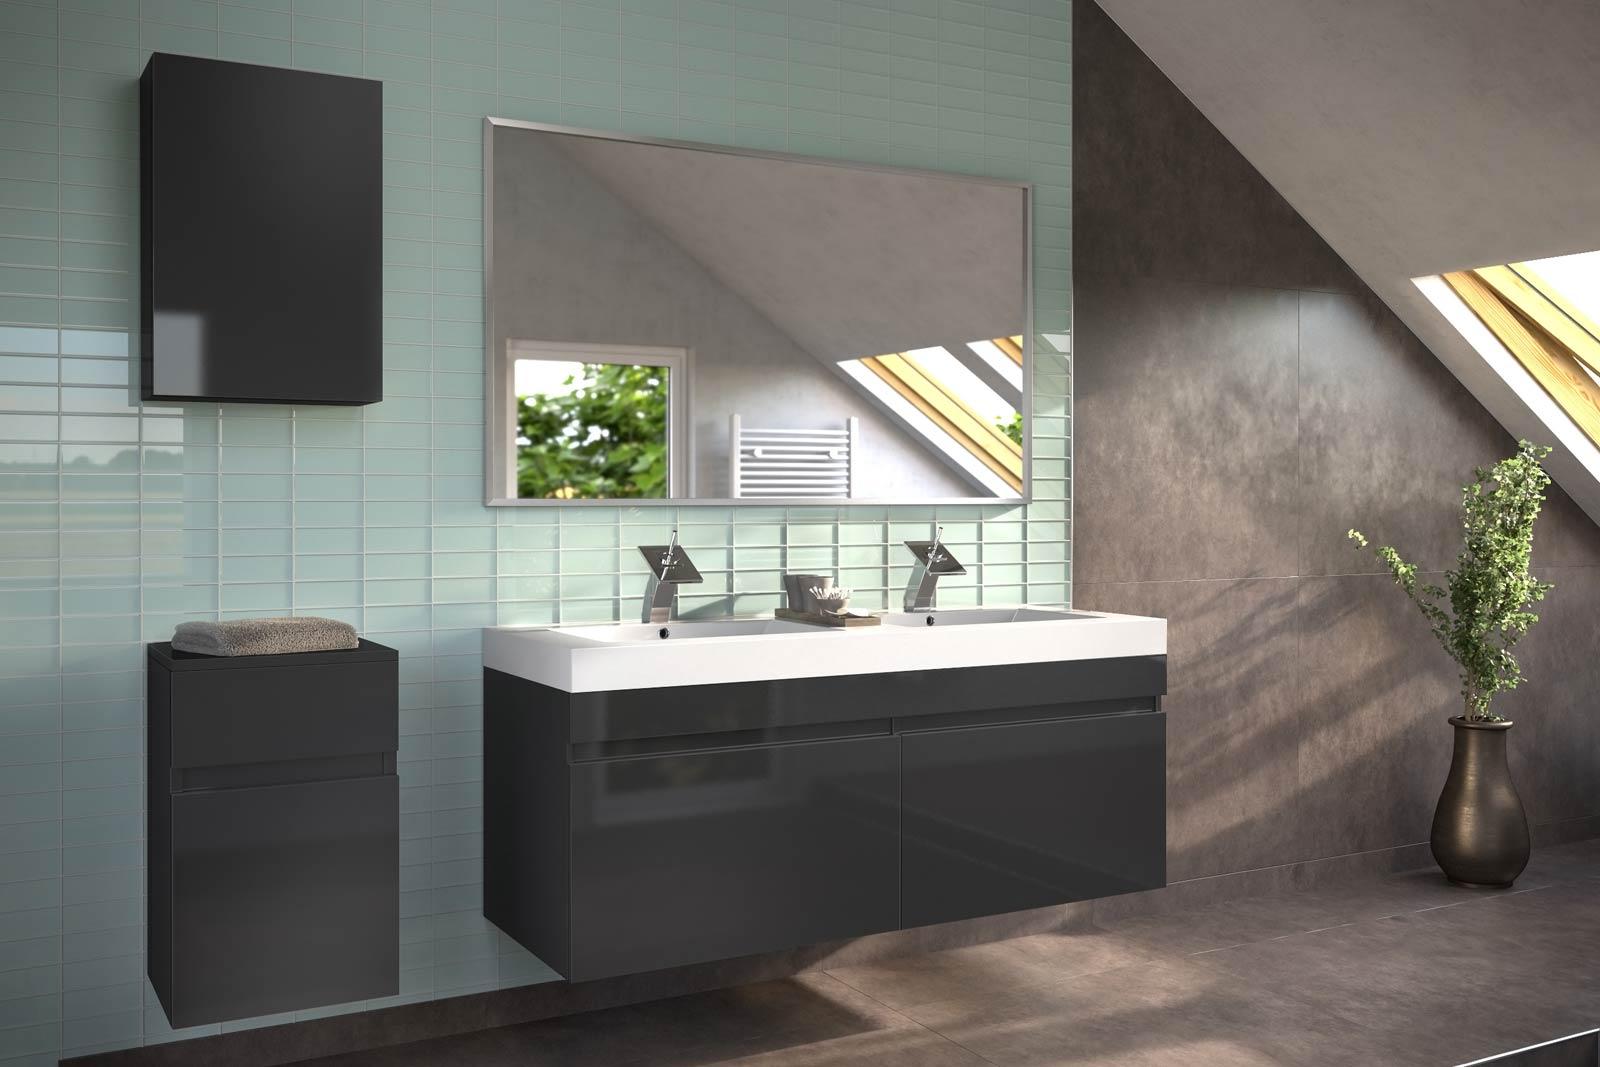 sam badm bel 4tlg set schwarz hochglanz parma auf lager. Black Bedroom Furniture Sets. Home Design Ideas